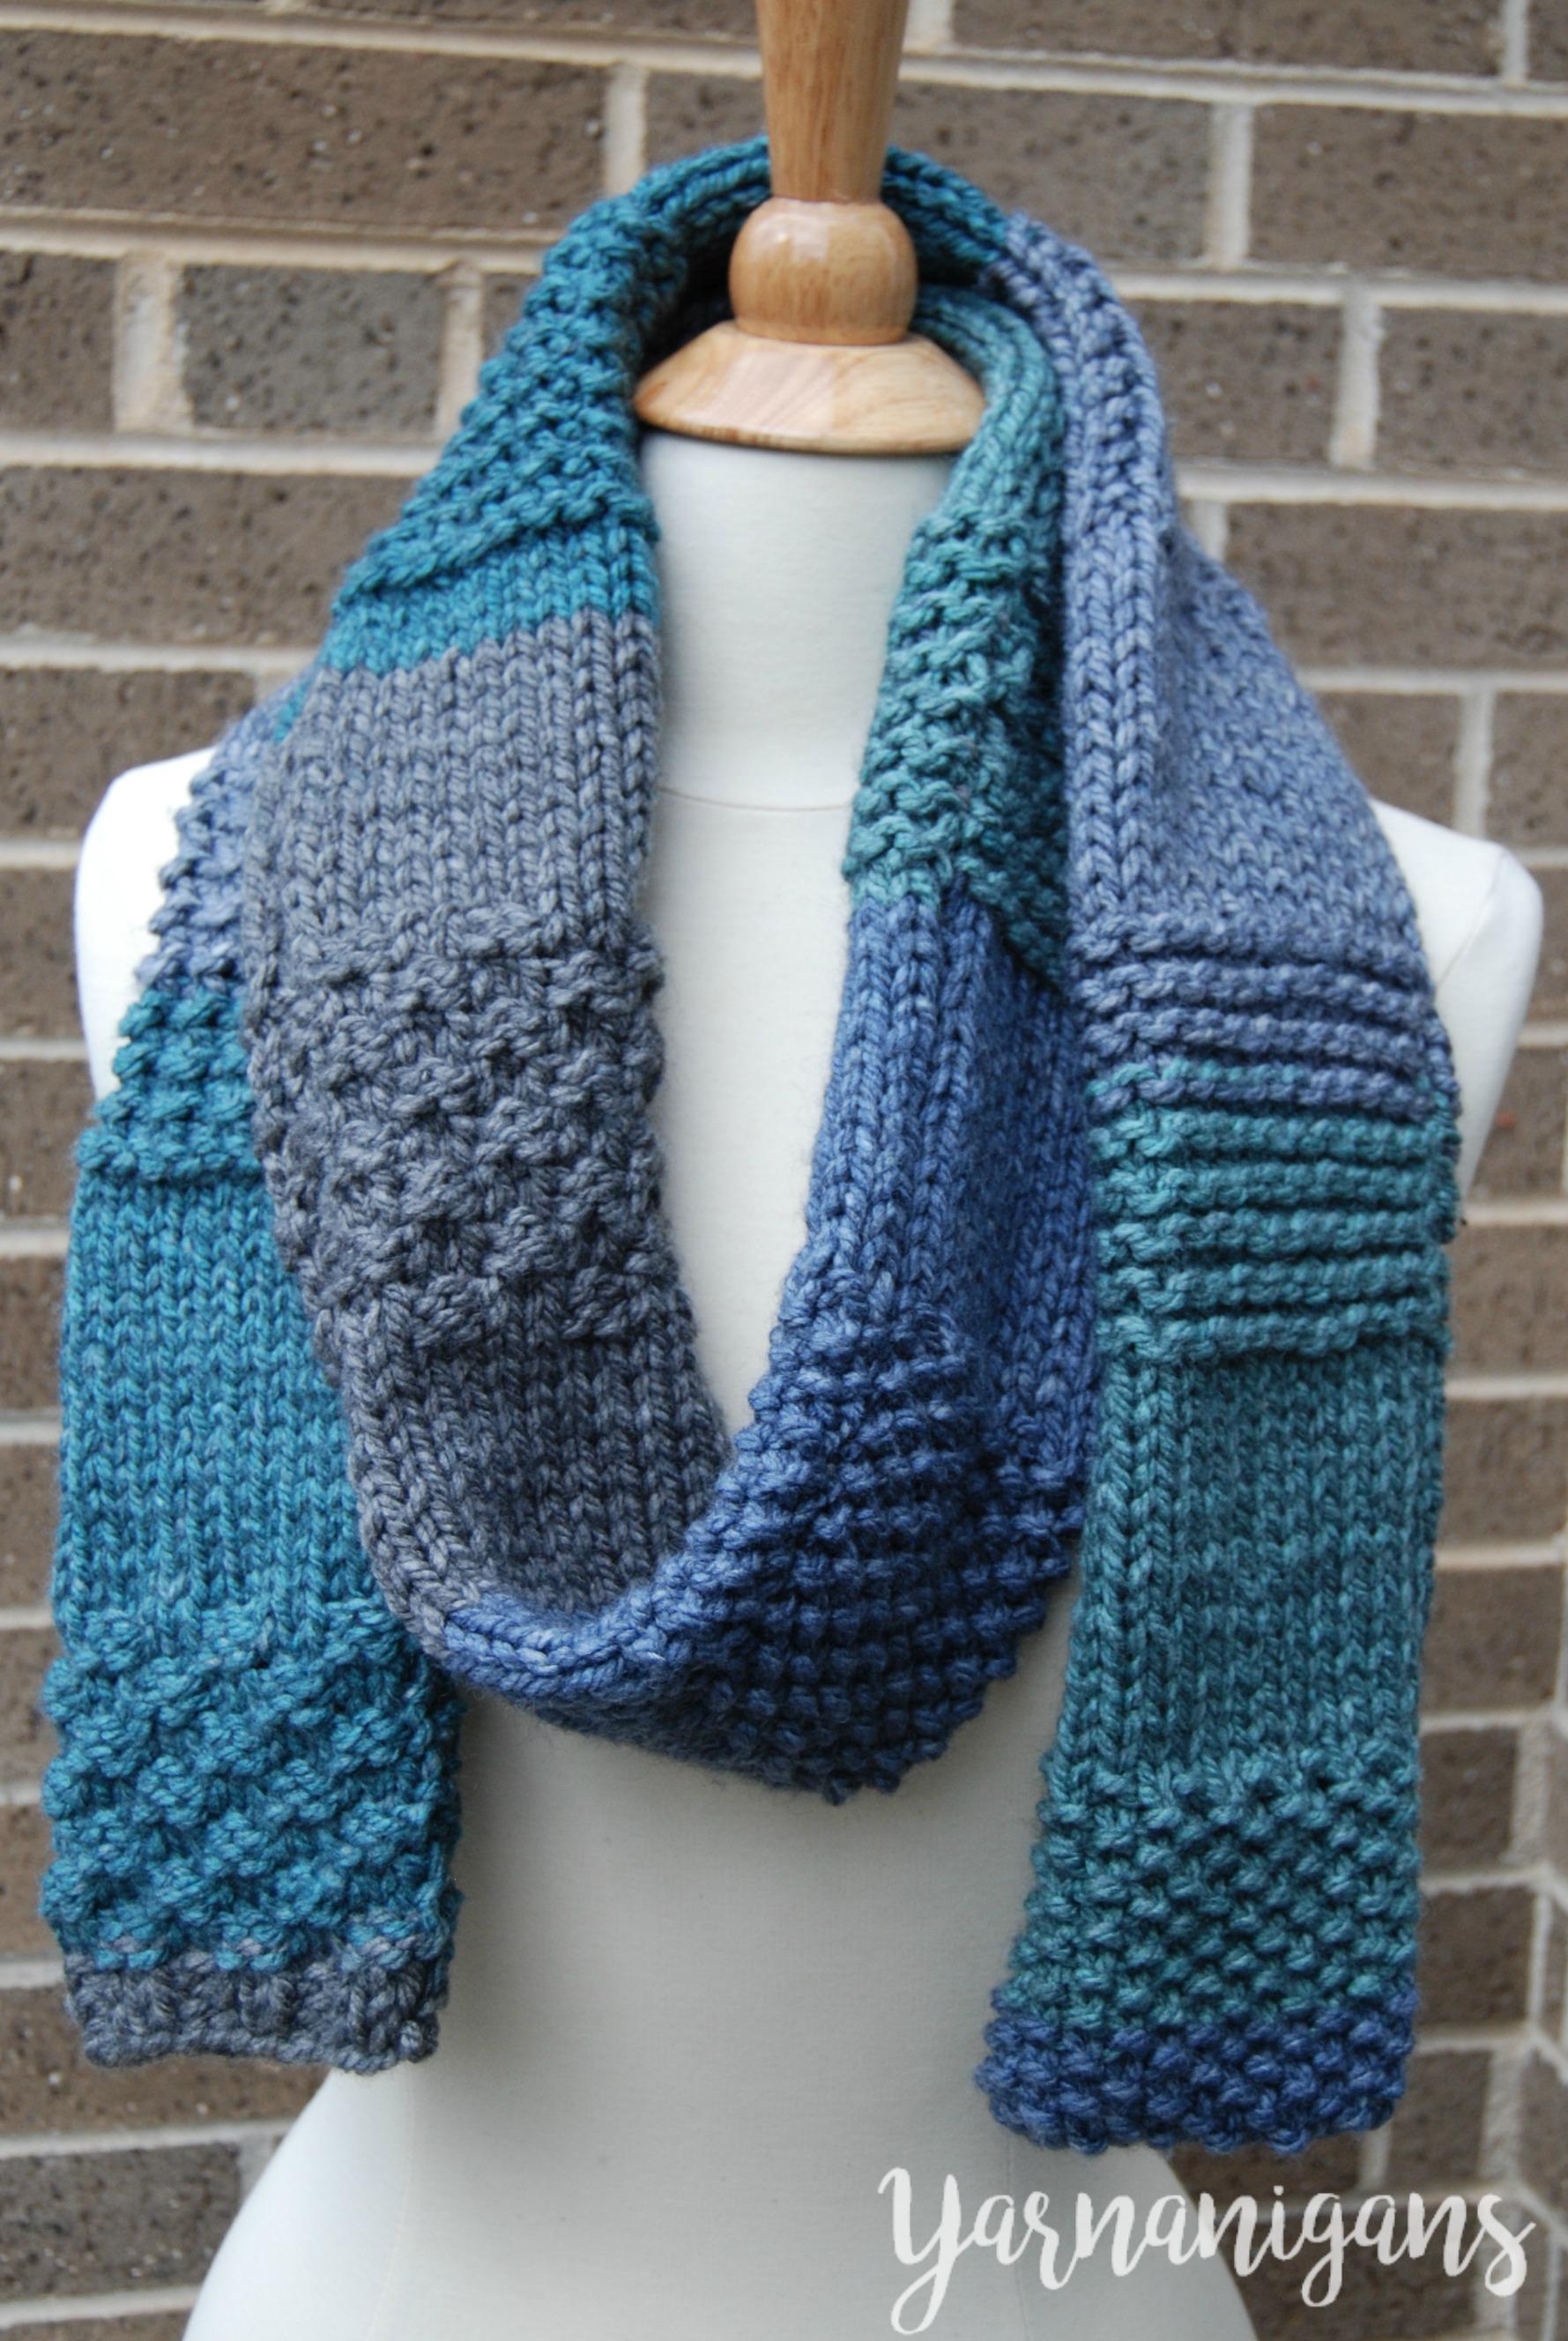 Knit Sampler Scarf - Free Knit Pattern - Yarnanigans